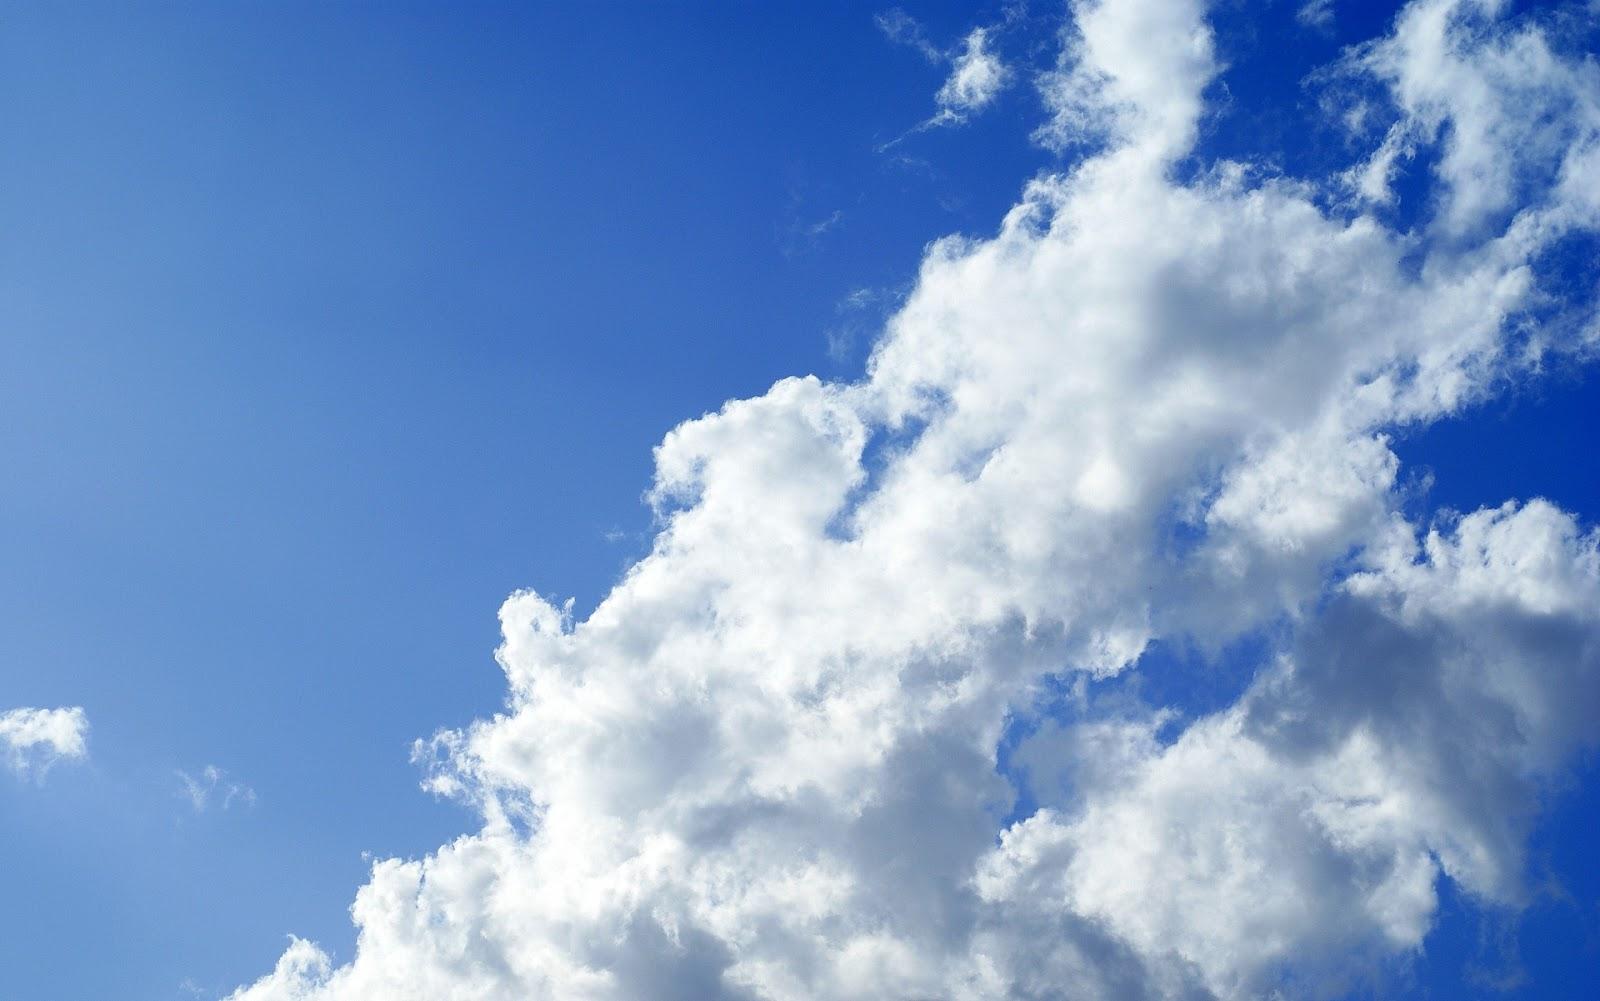 sky cloud wallpapers hd - Free Wallpaper